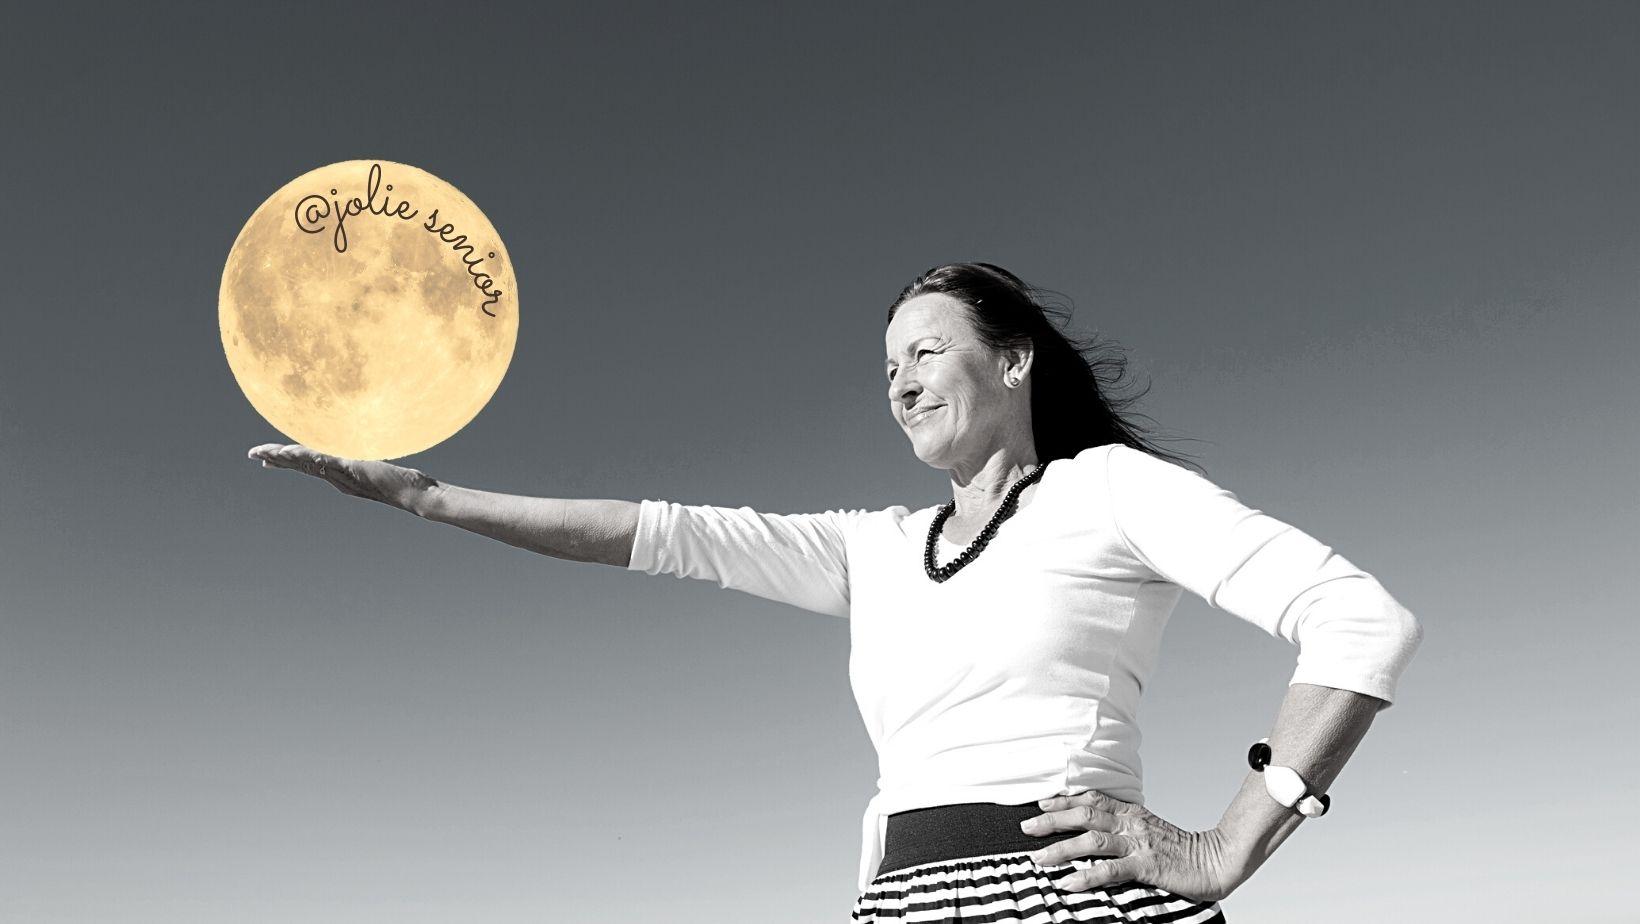 rv avec la lune